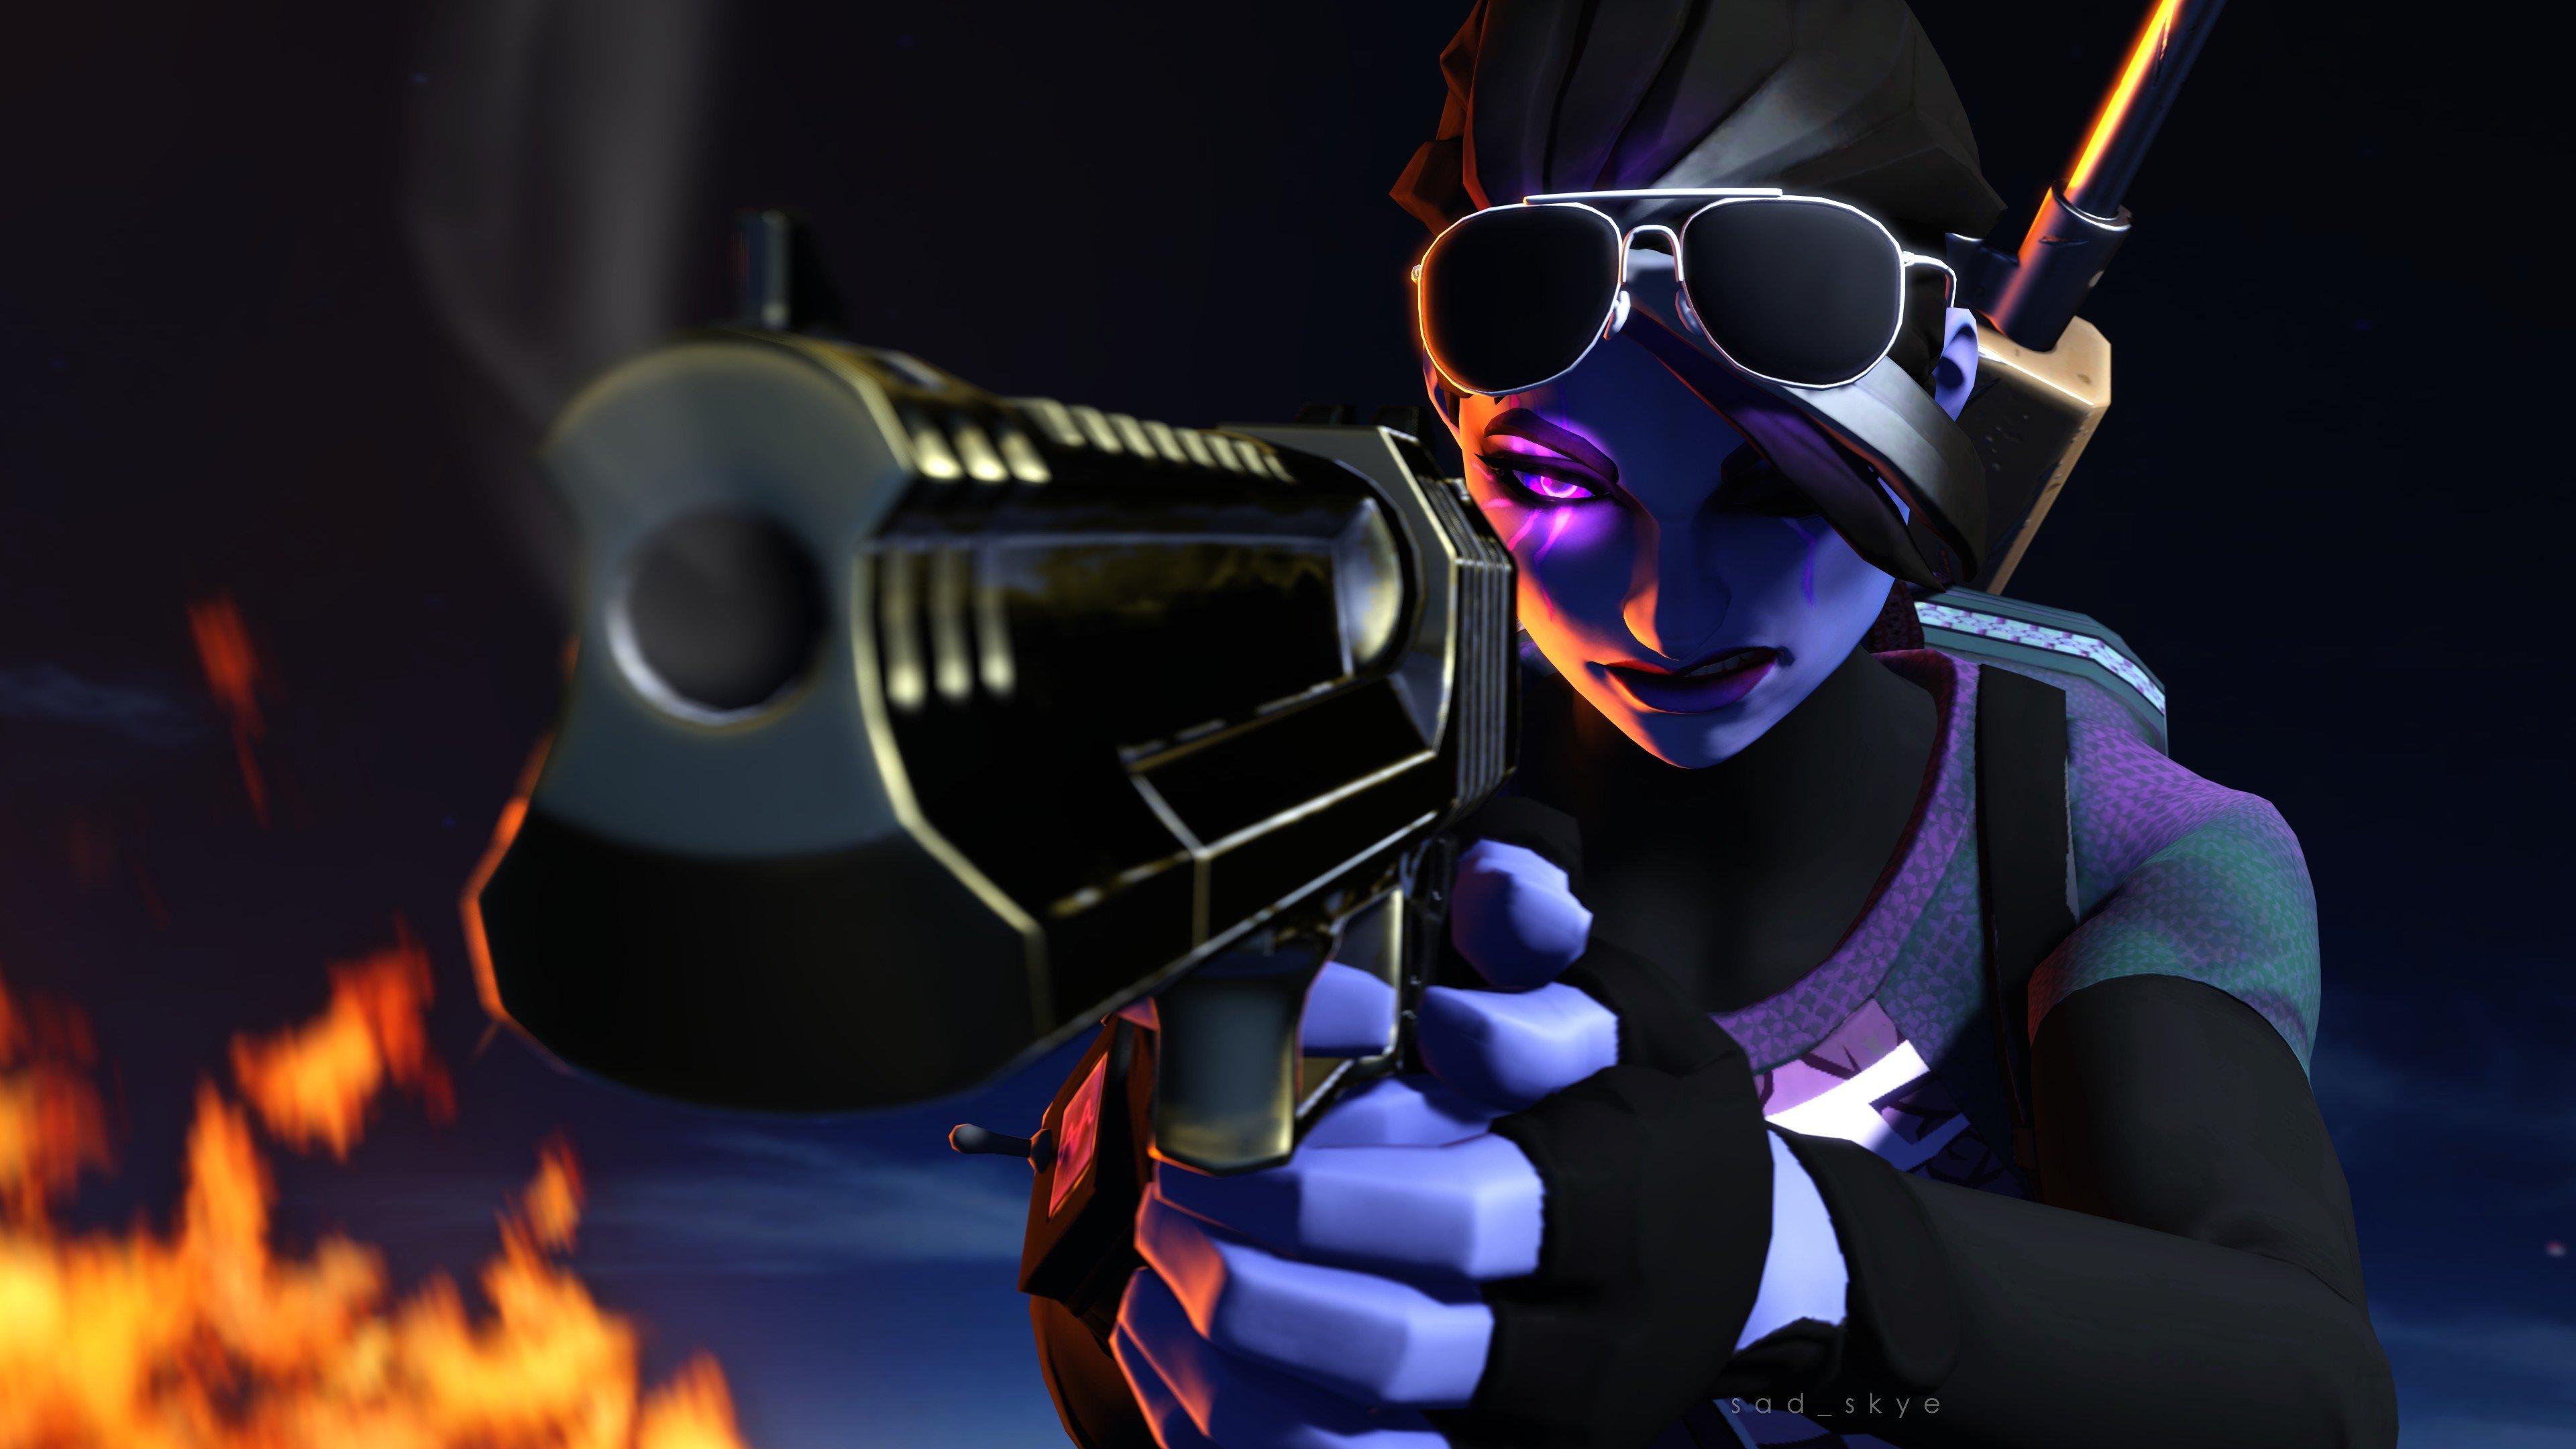 Fondos de pantalla Fortnite Dark Bomber